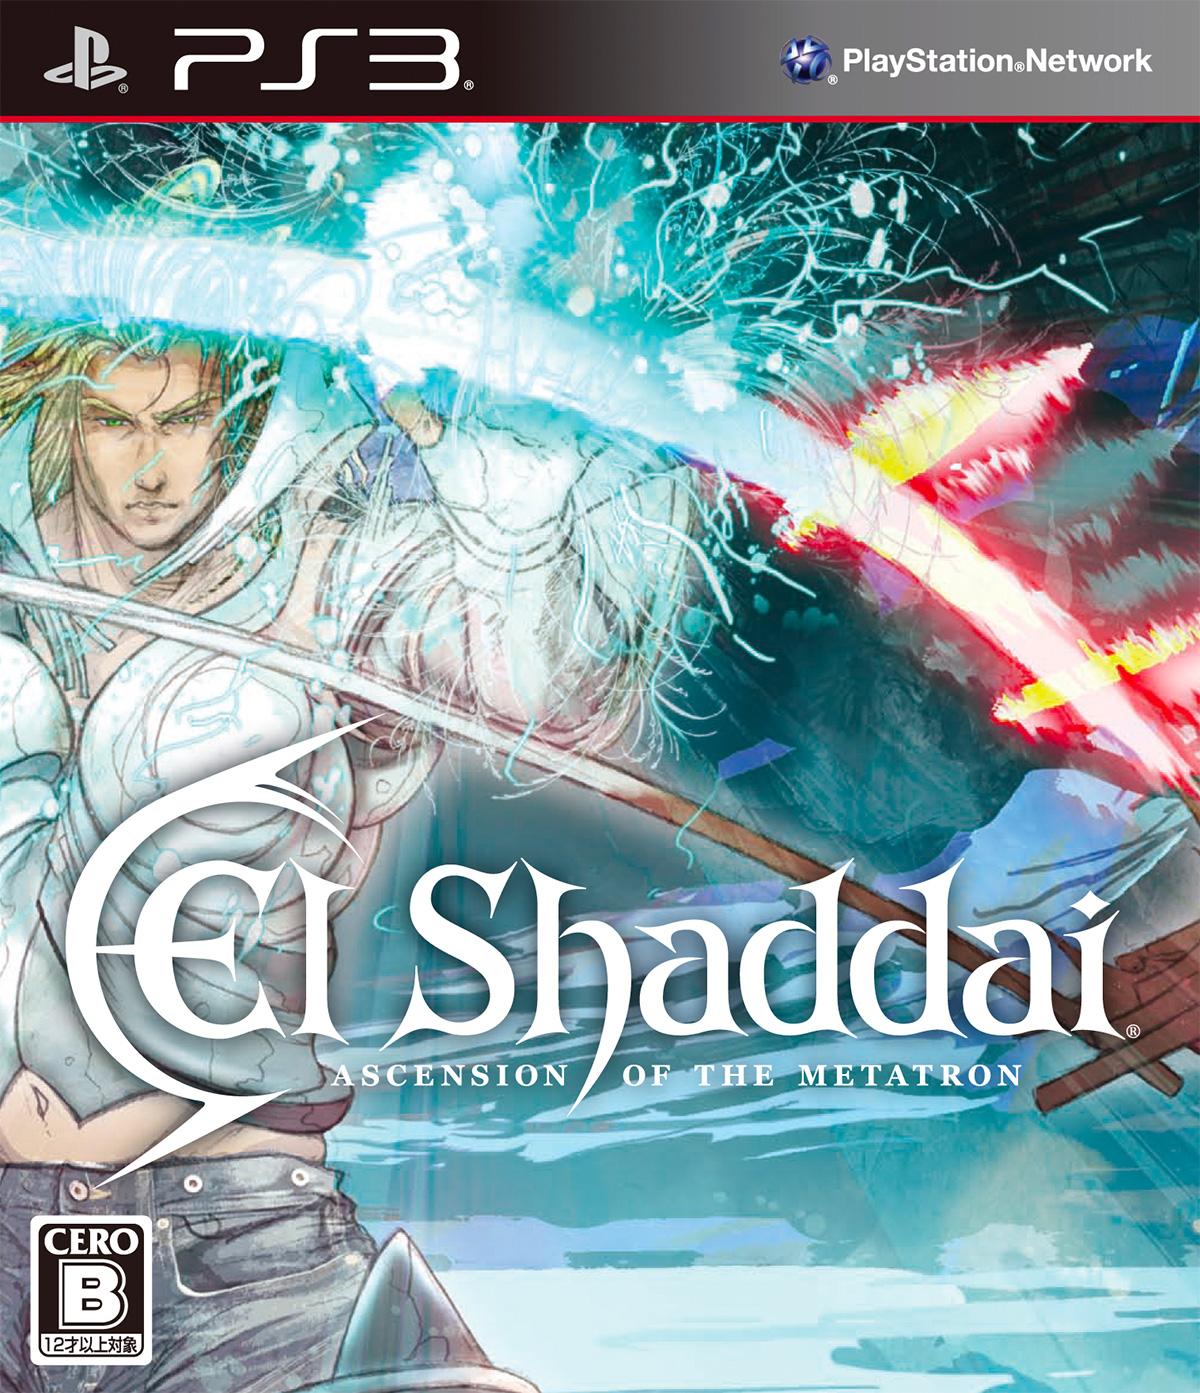 El shaddai – エルシャダイ – ASCENSION OF THE METATRON